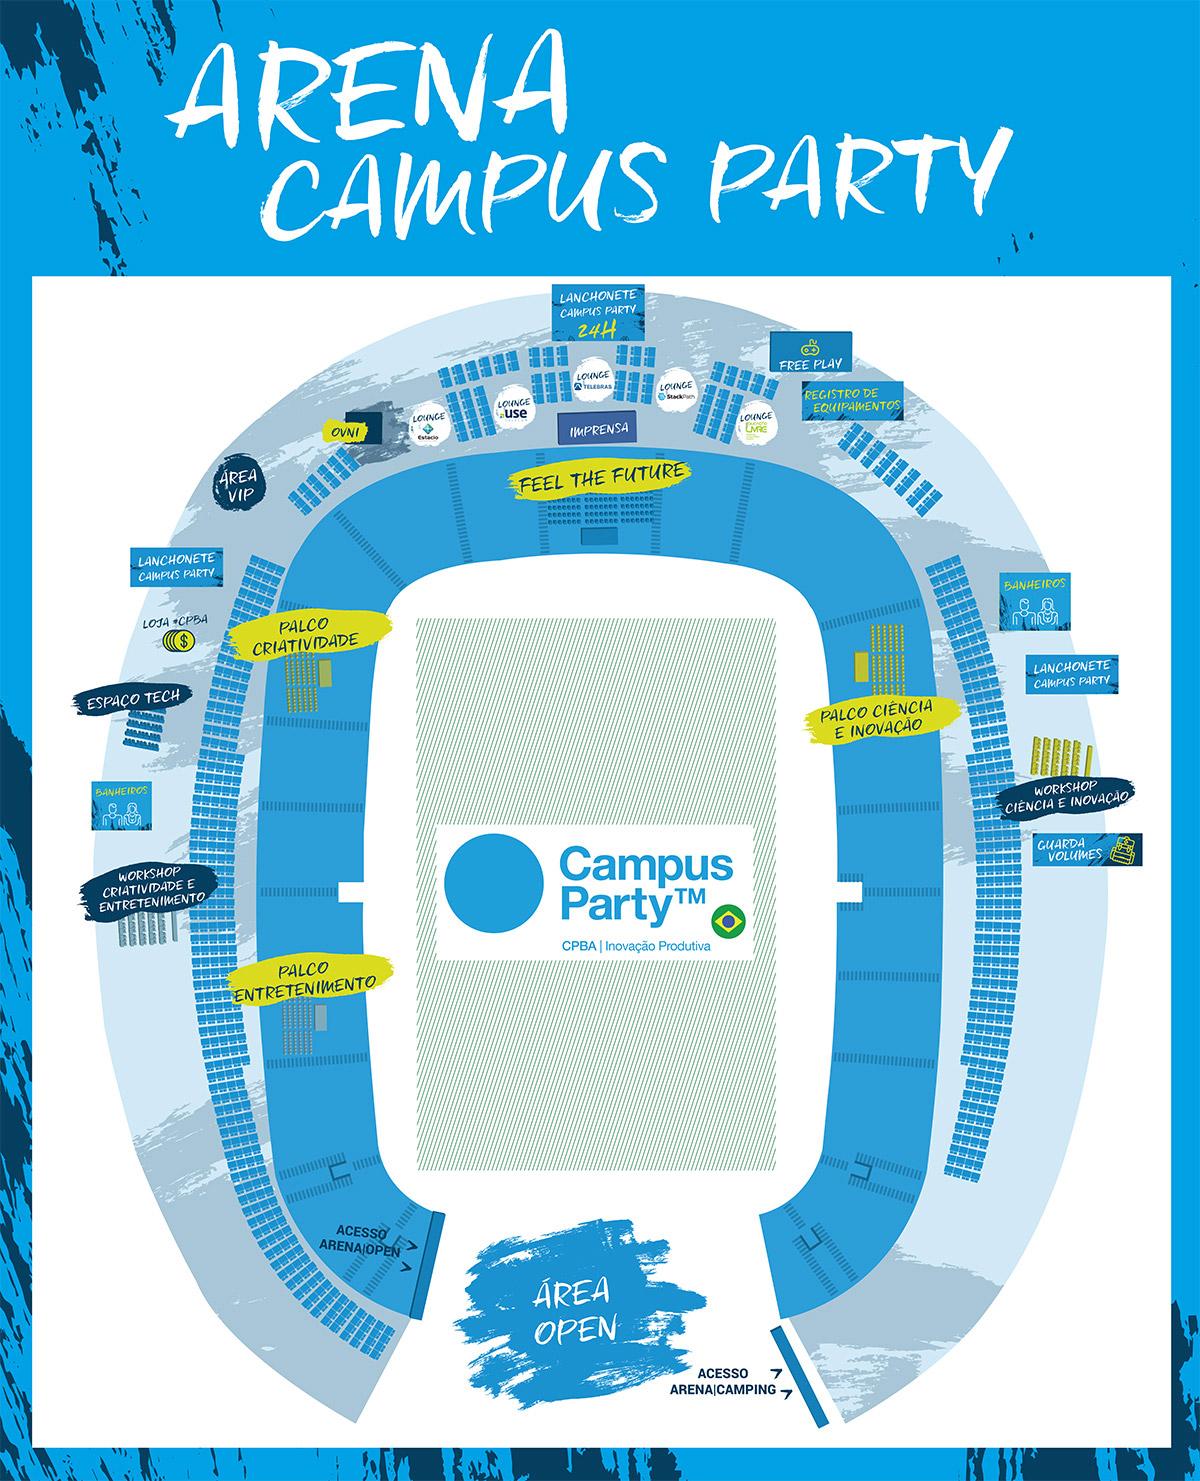 Arena Campus Party